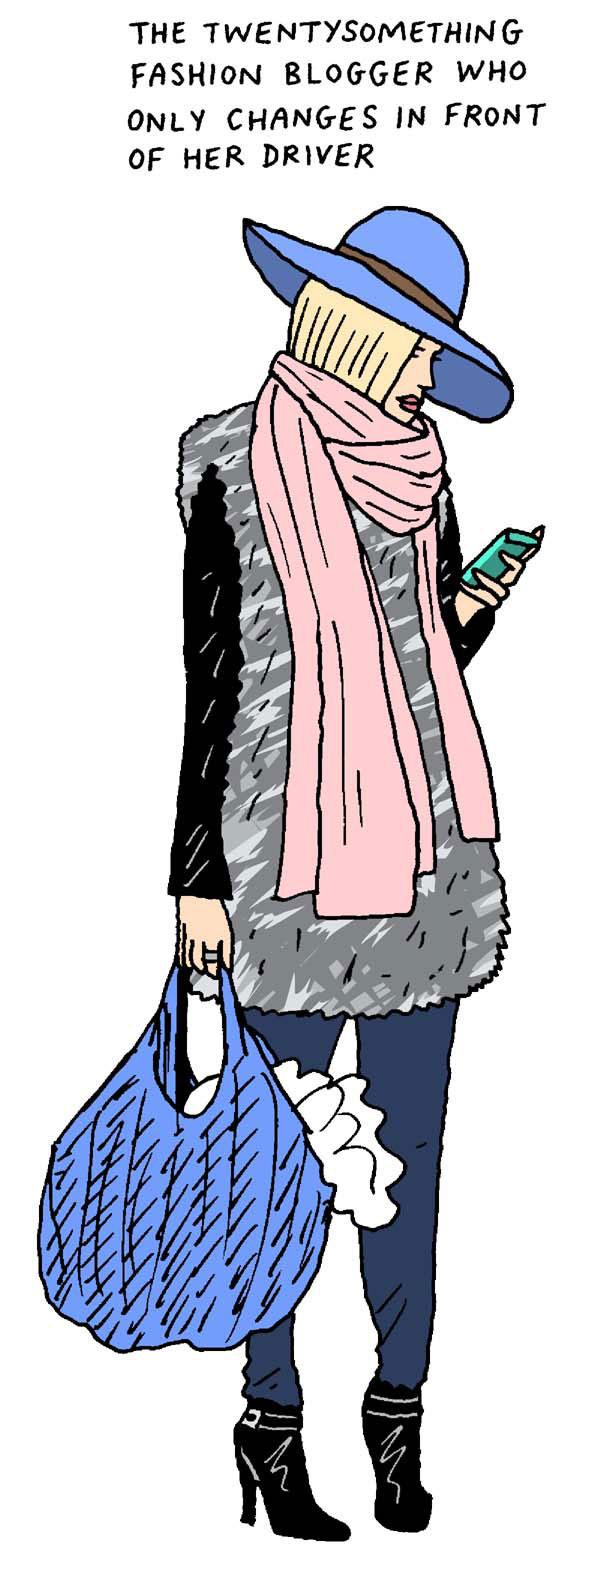 9-20-something-fashion-blogger.nocrop.w710.h2147483647.jpg